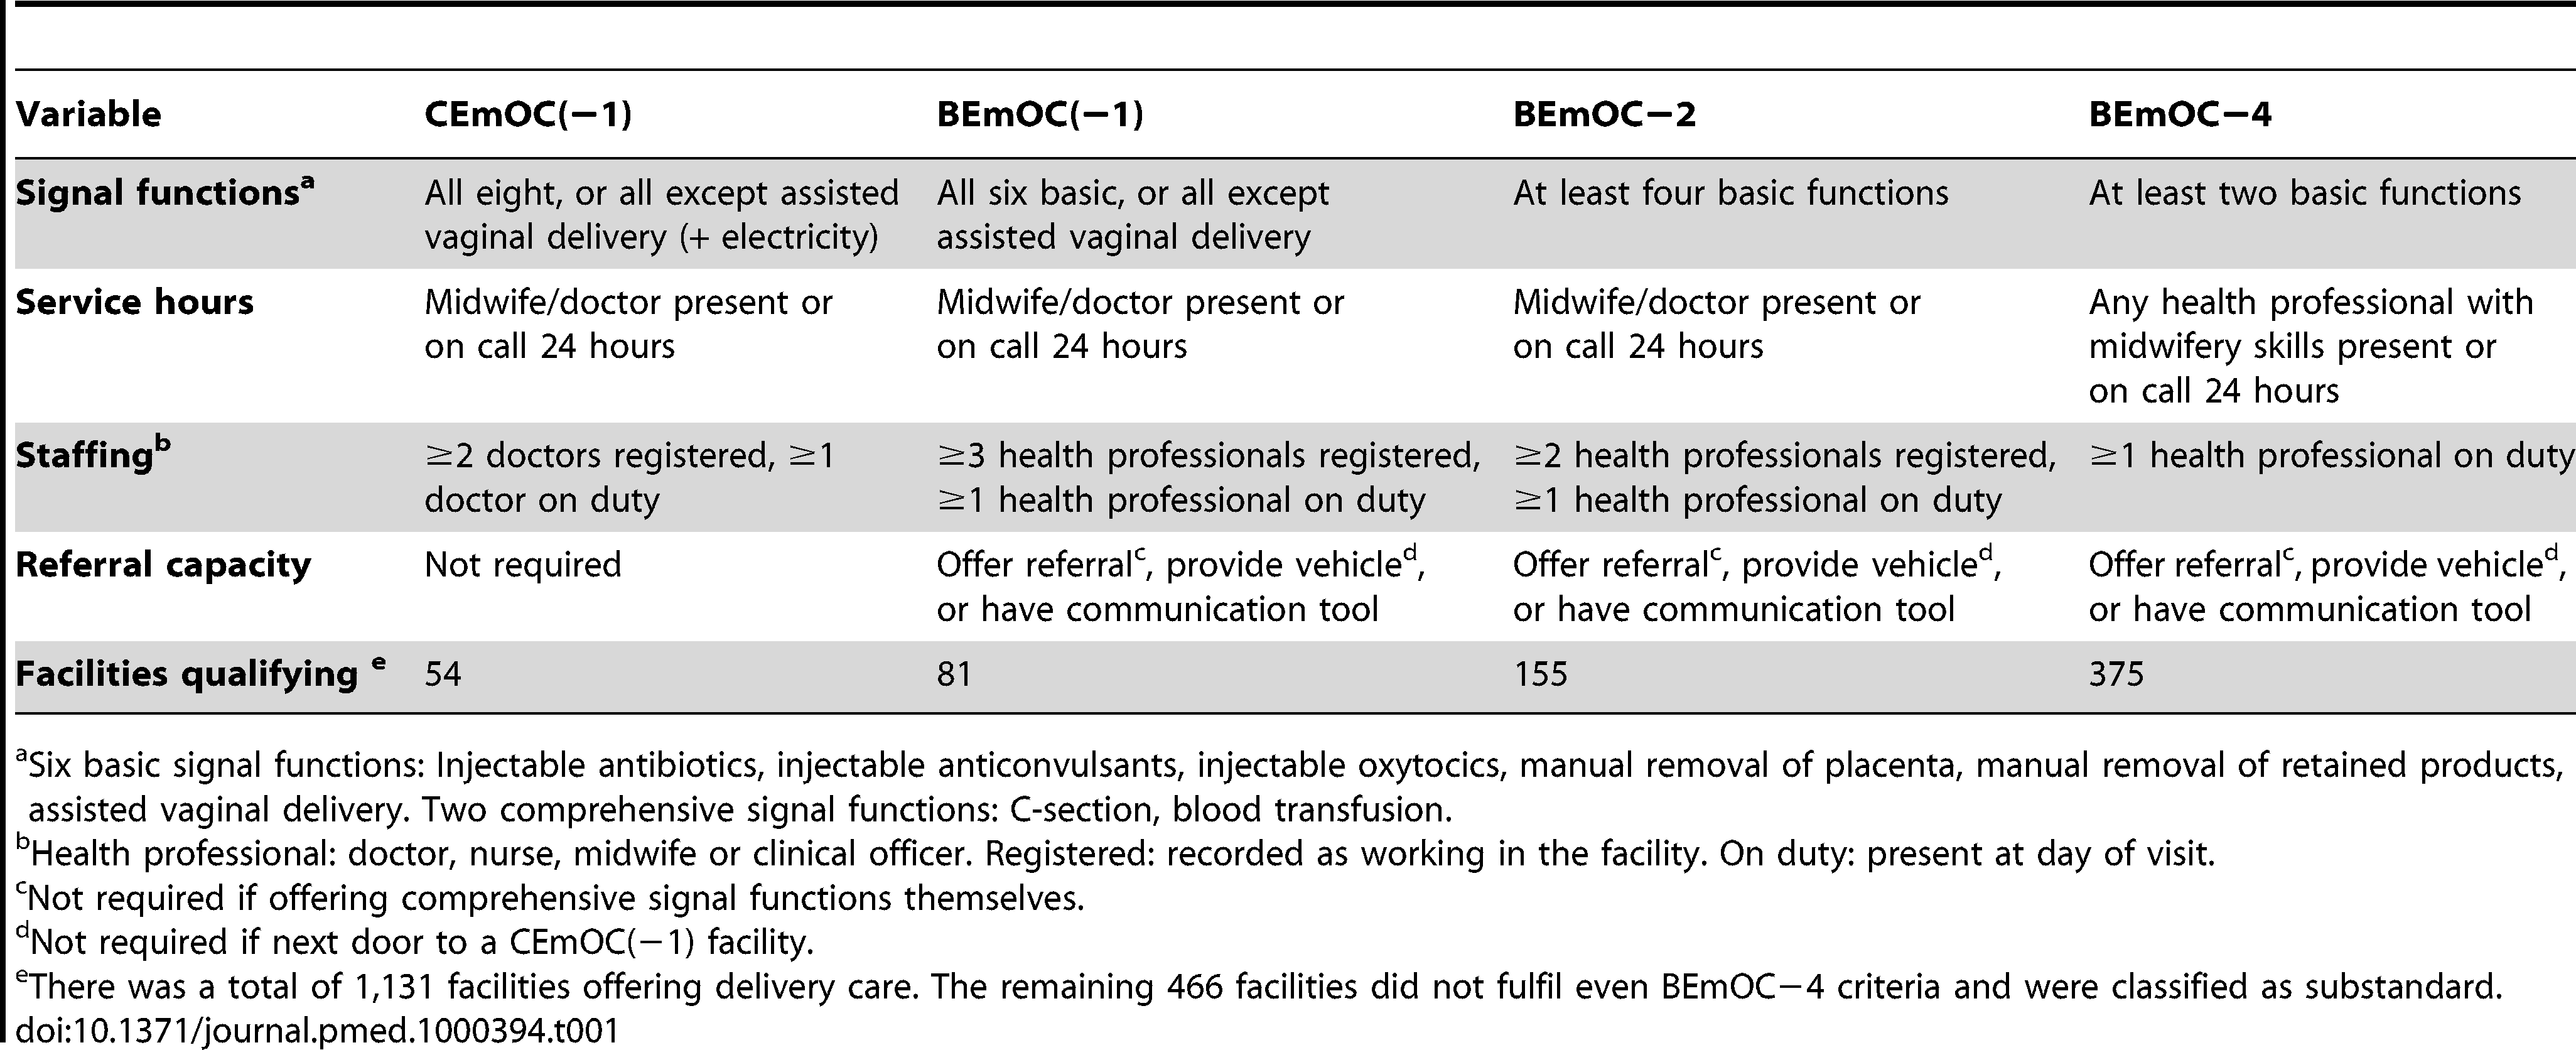 EmOC classification of Zambian health facilities.